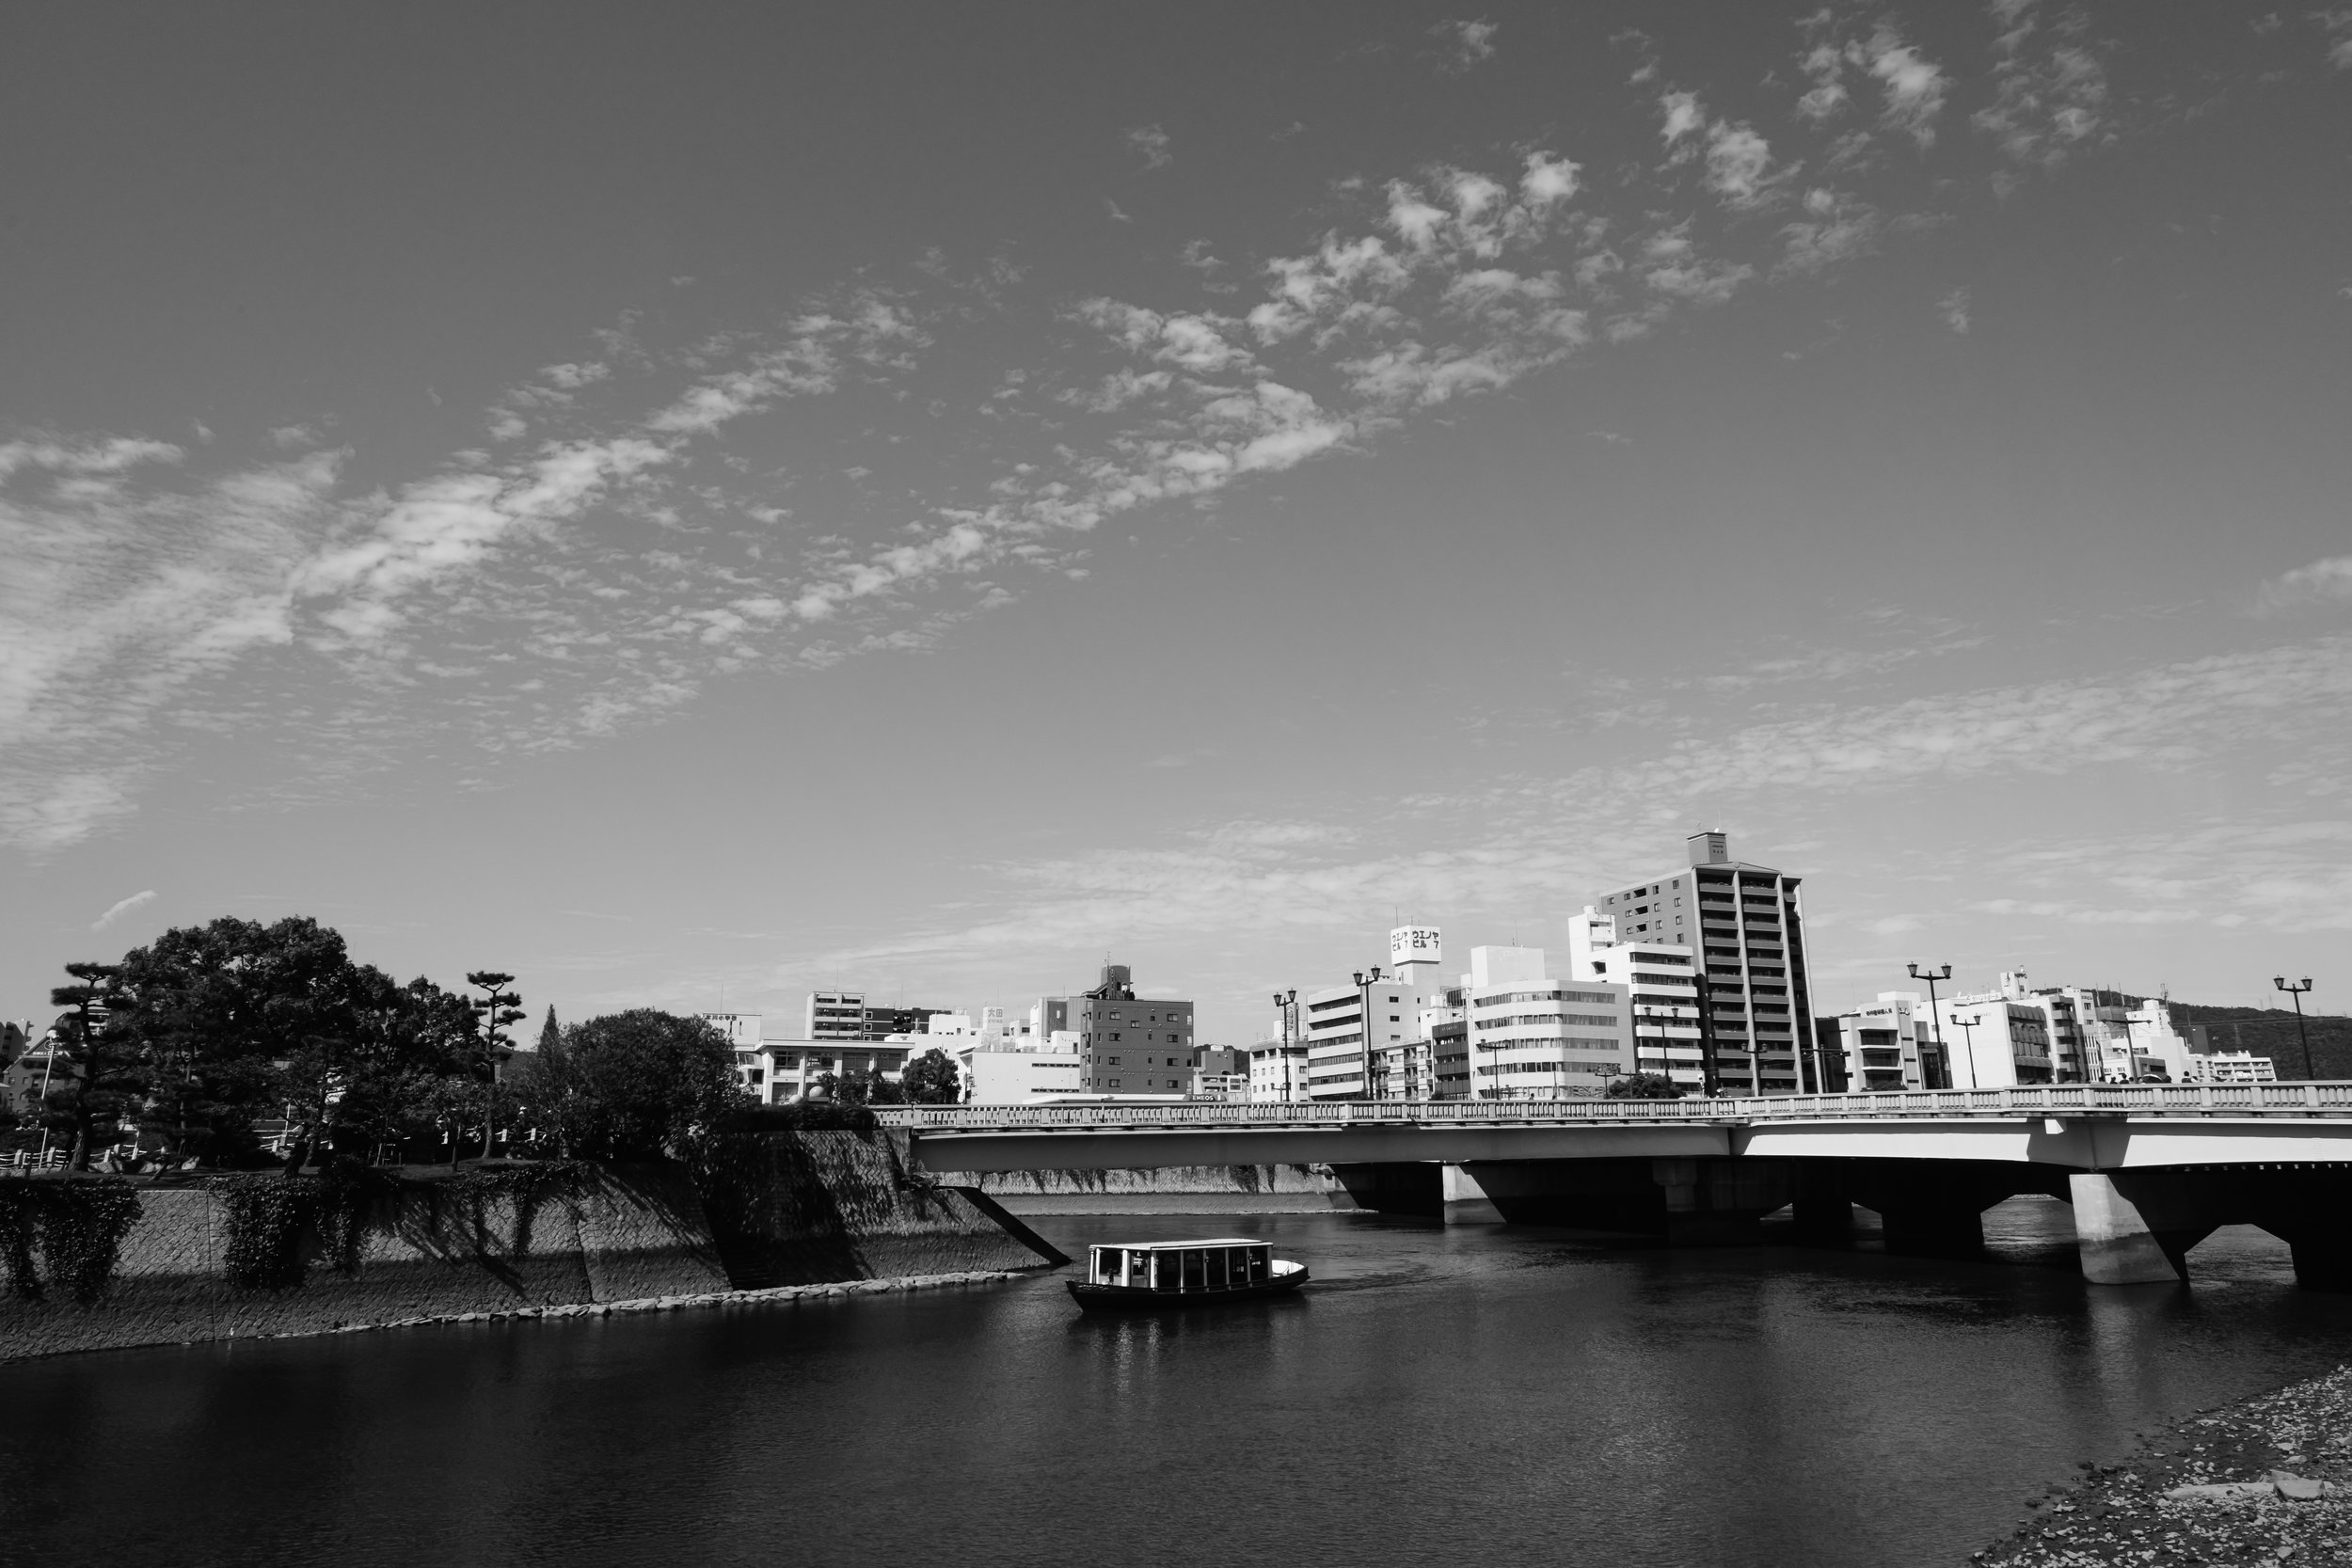 Hiroshima River Boat